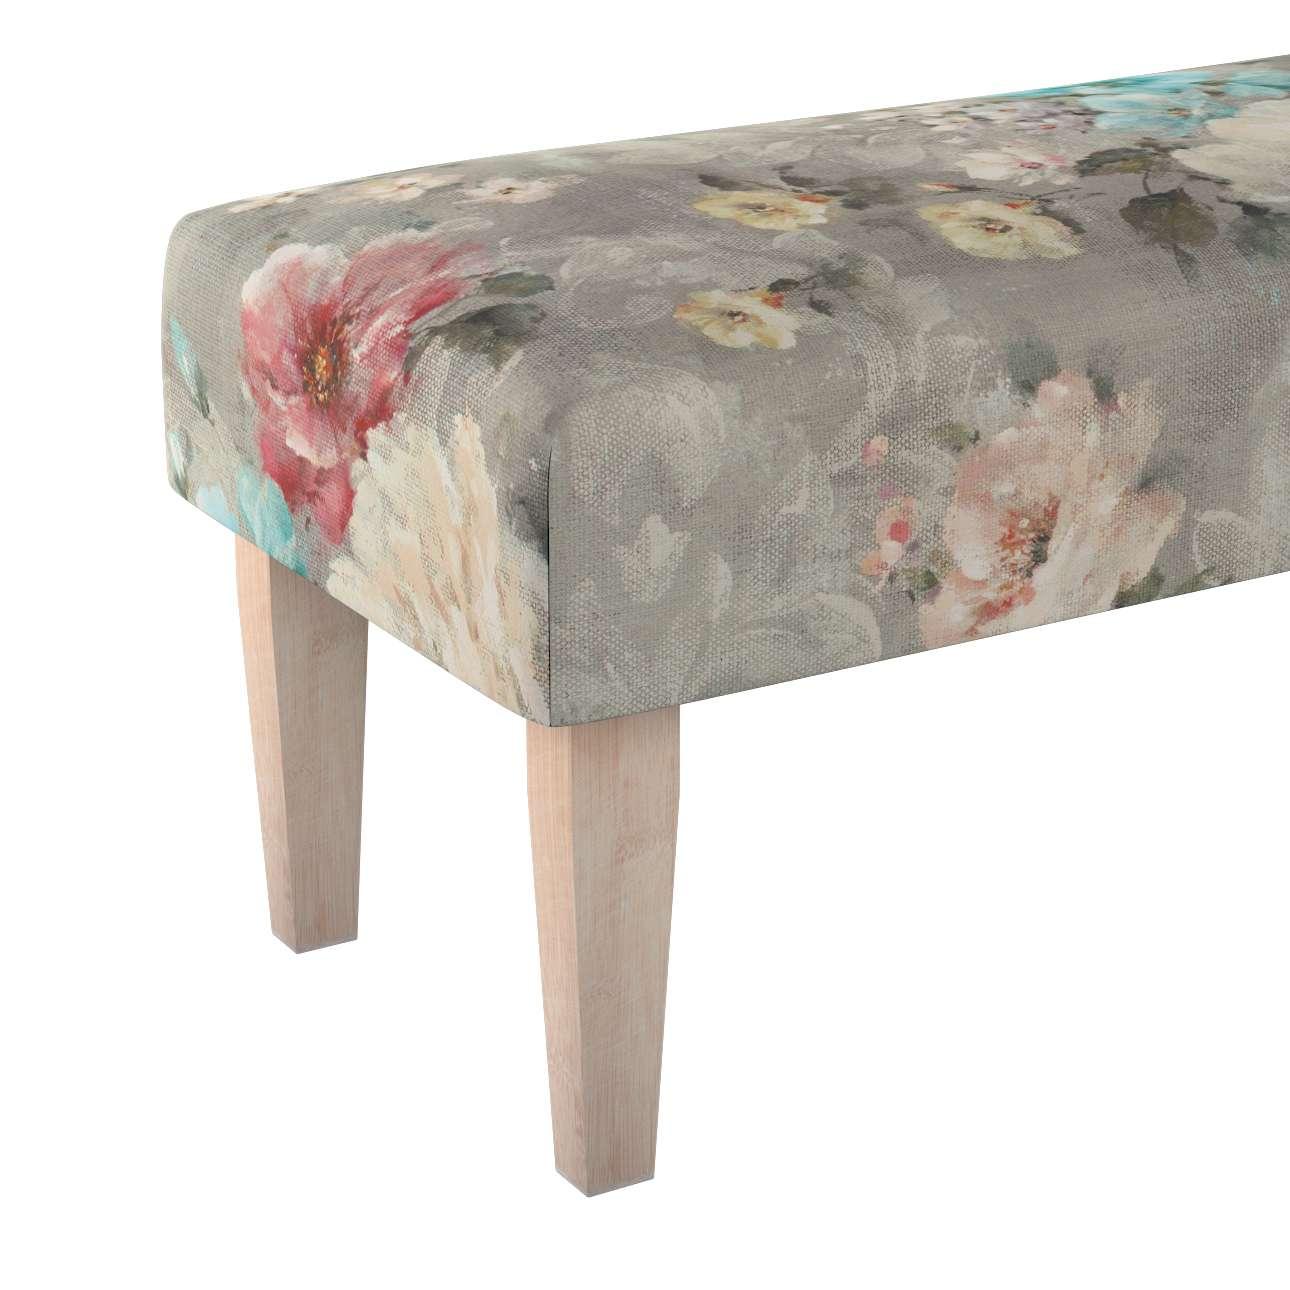 Ławka w kolekcji Monet, tkanina: 137-81